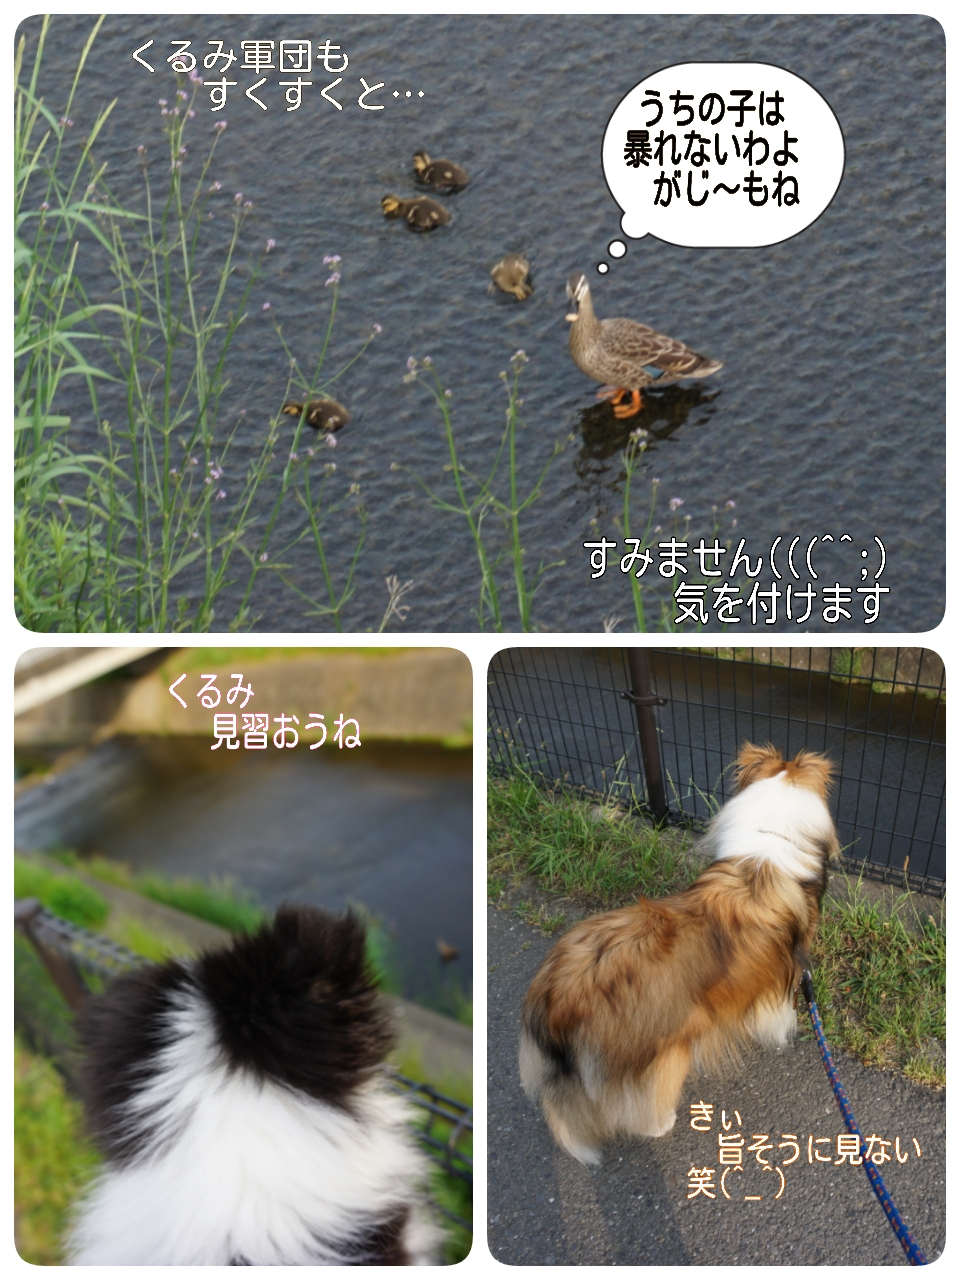 2015-05-20-21-38-14_deco.jpg